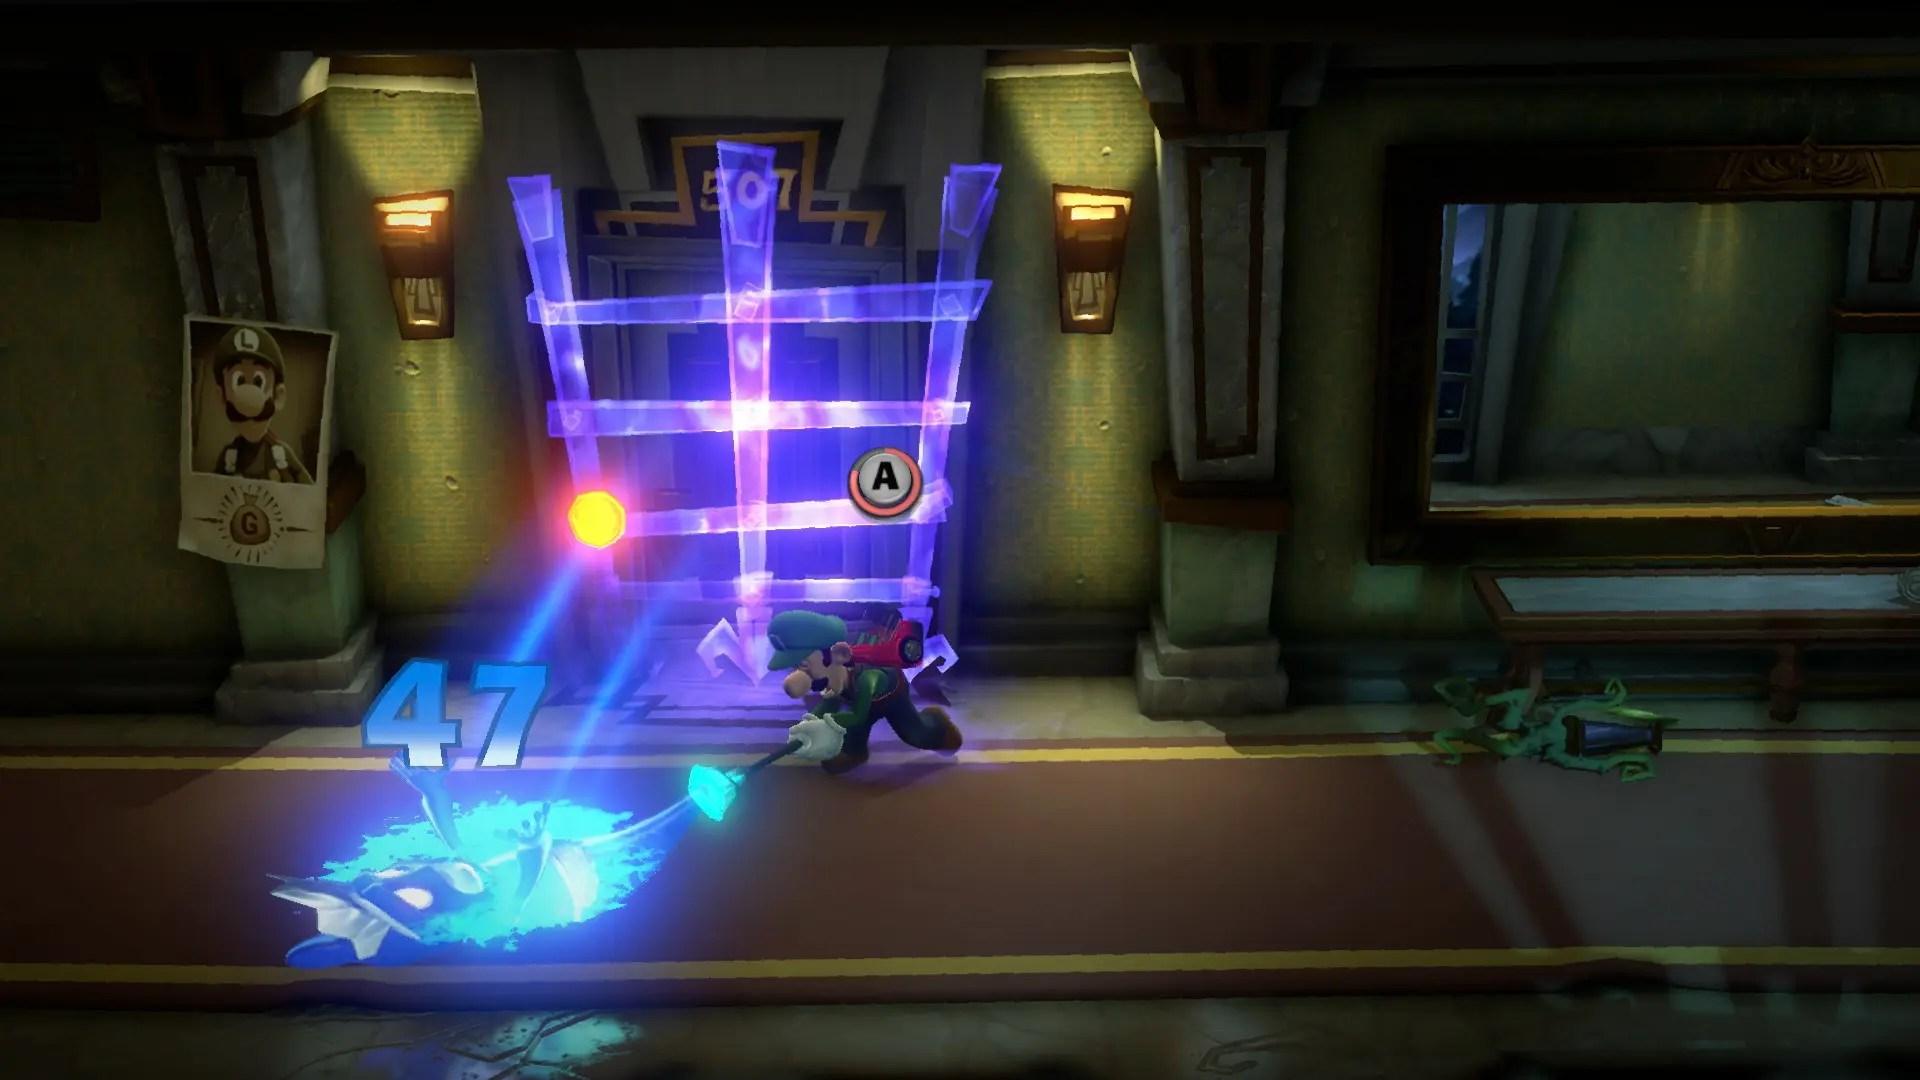 Luigi's Mansion 3 E3 2019 Screenshot 8